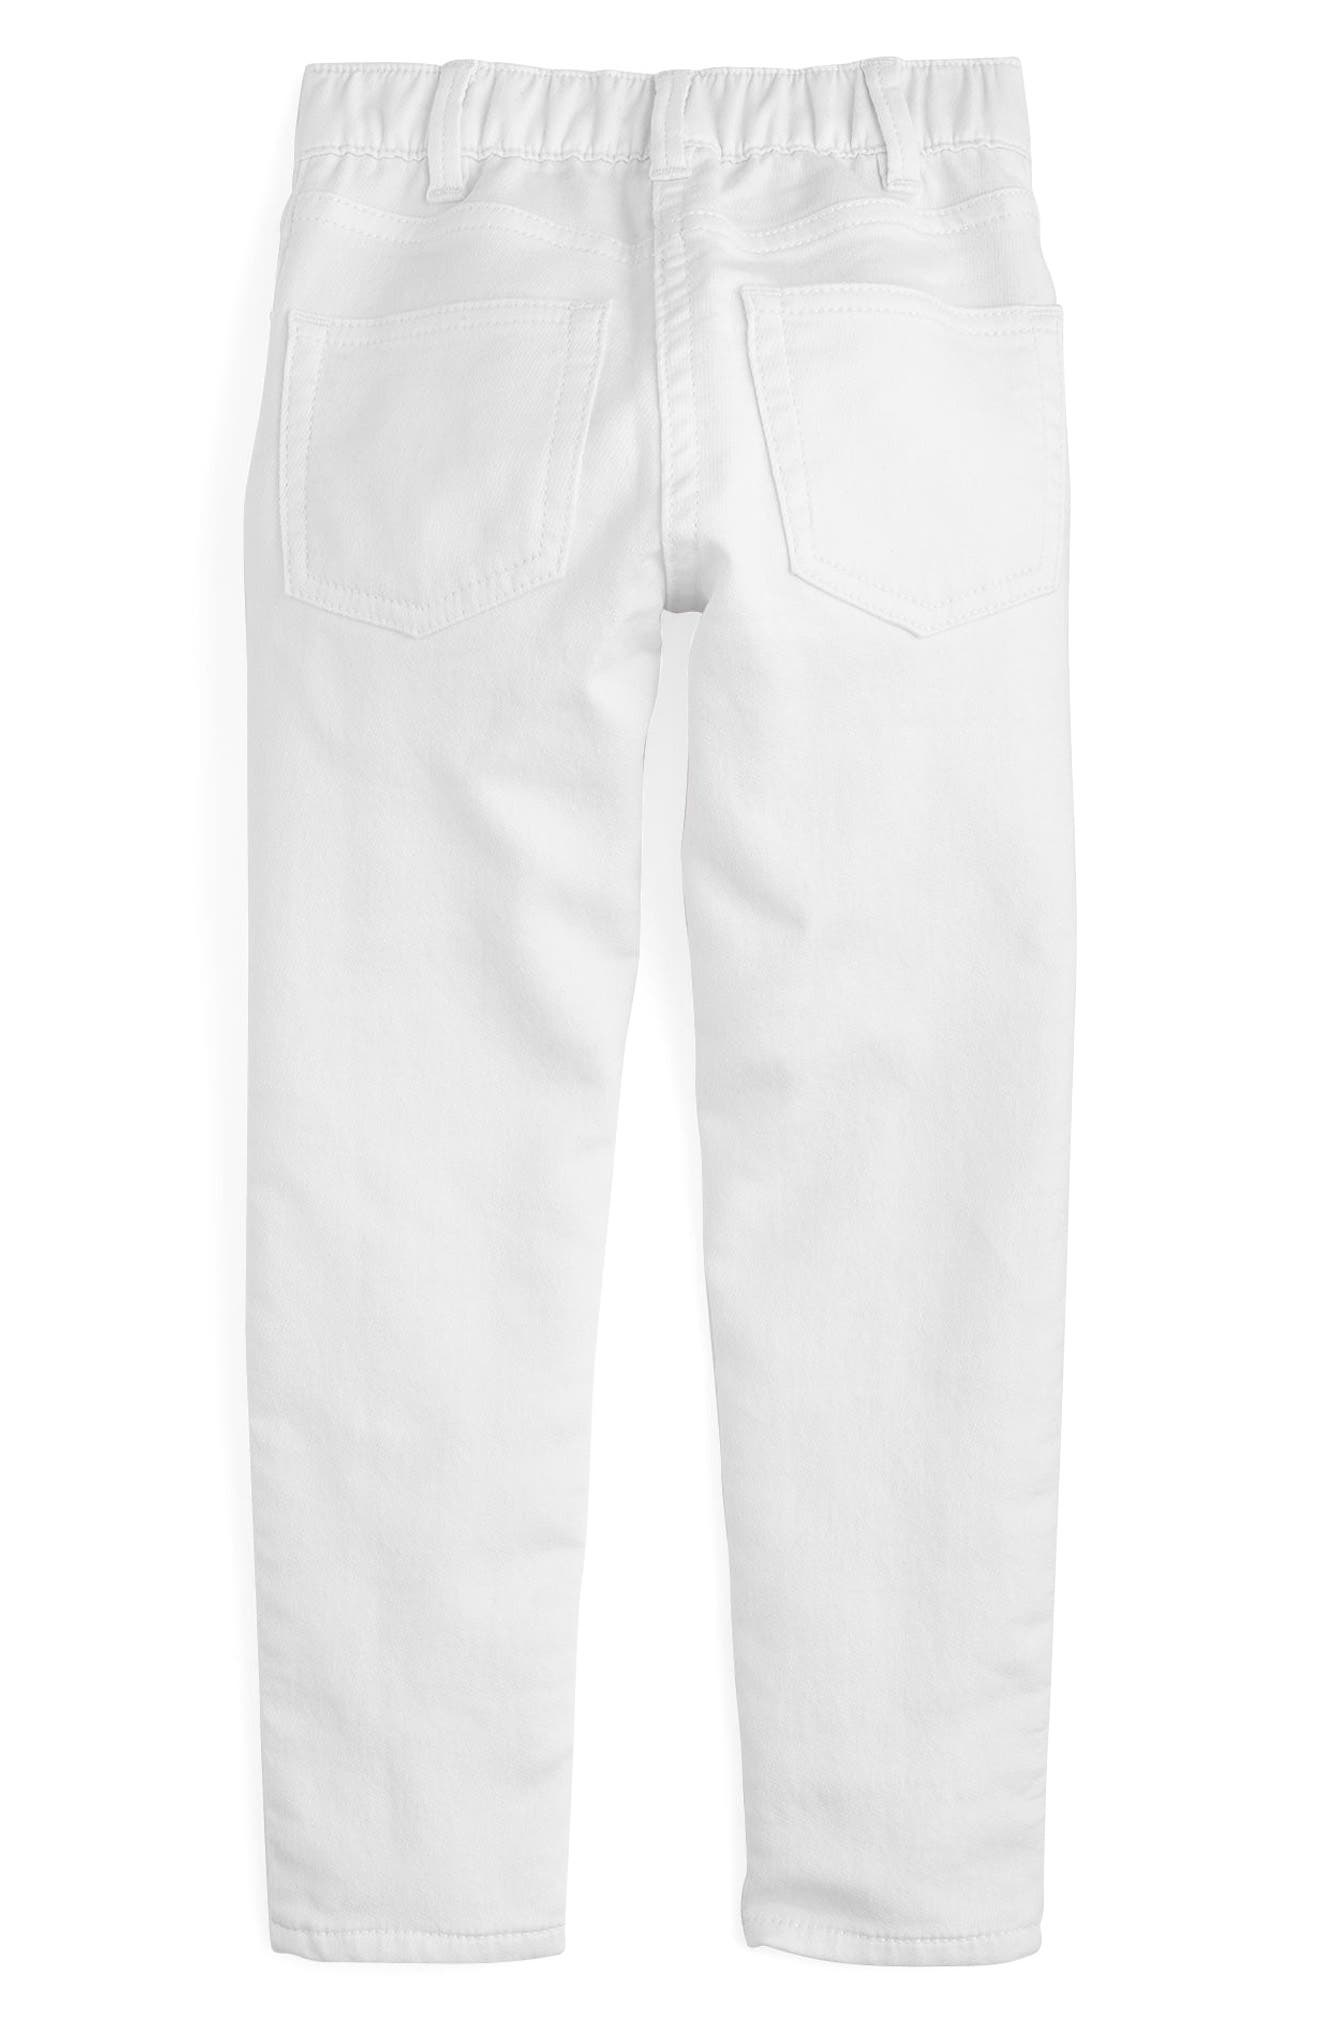 Runaround Garment Dye Jeans,                             Alternate thumbnail 2, color,                             White